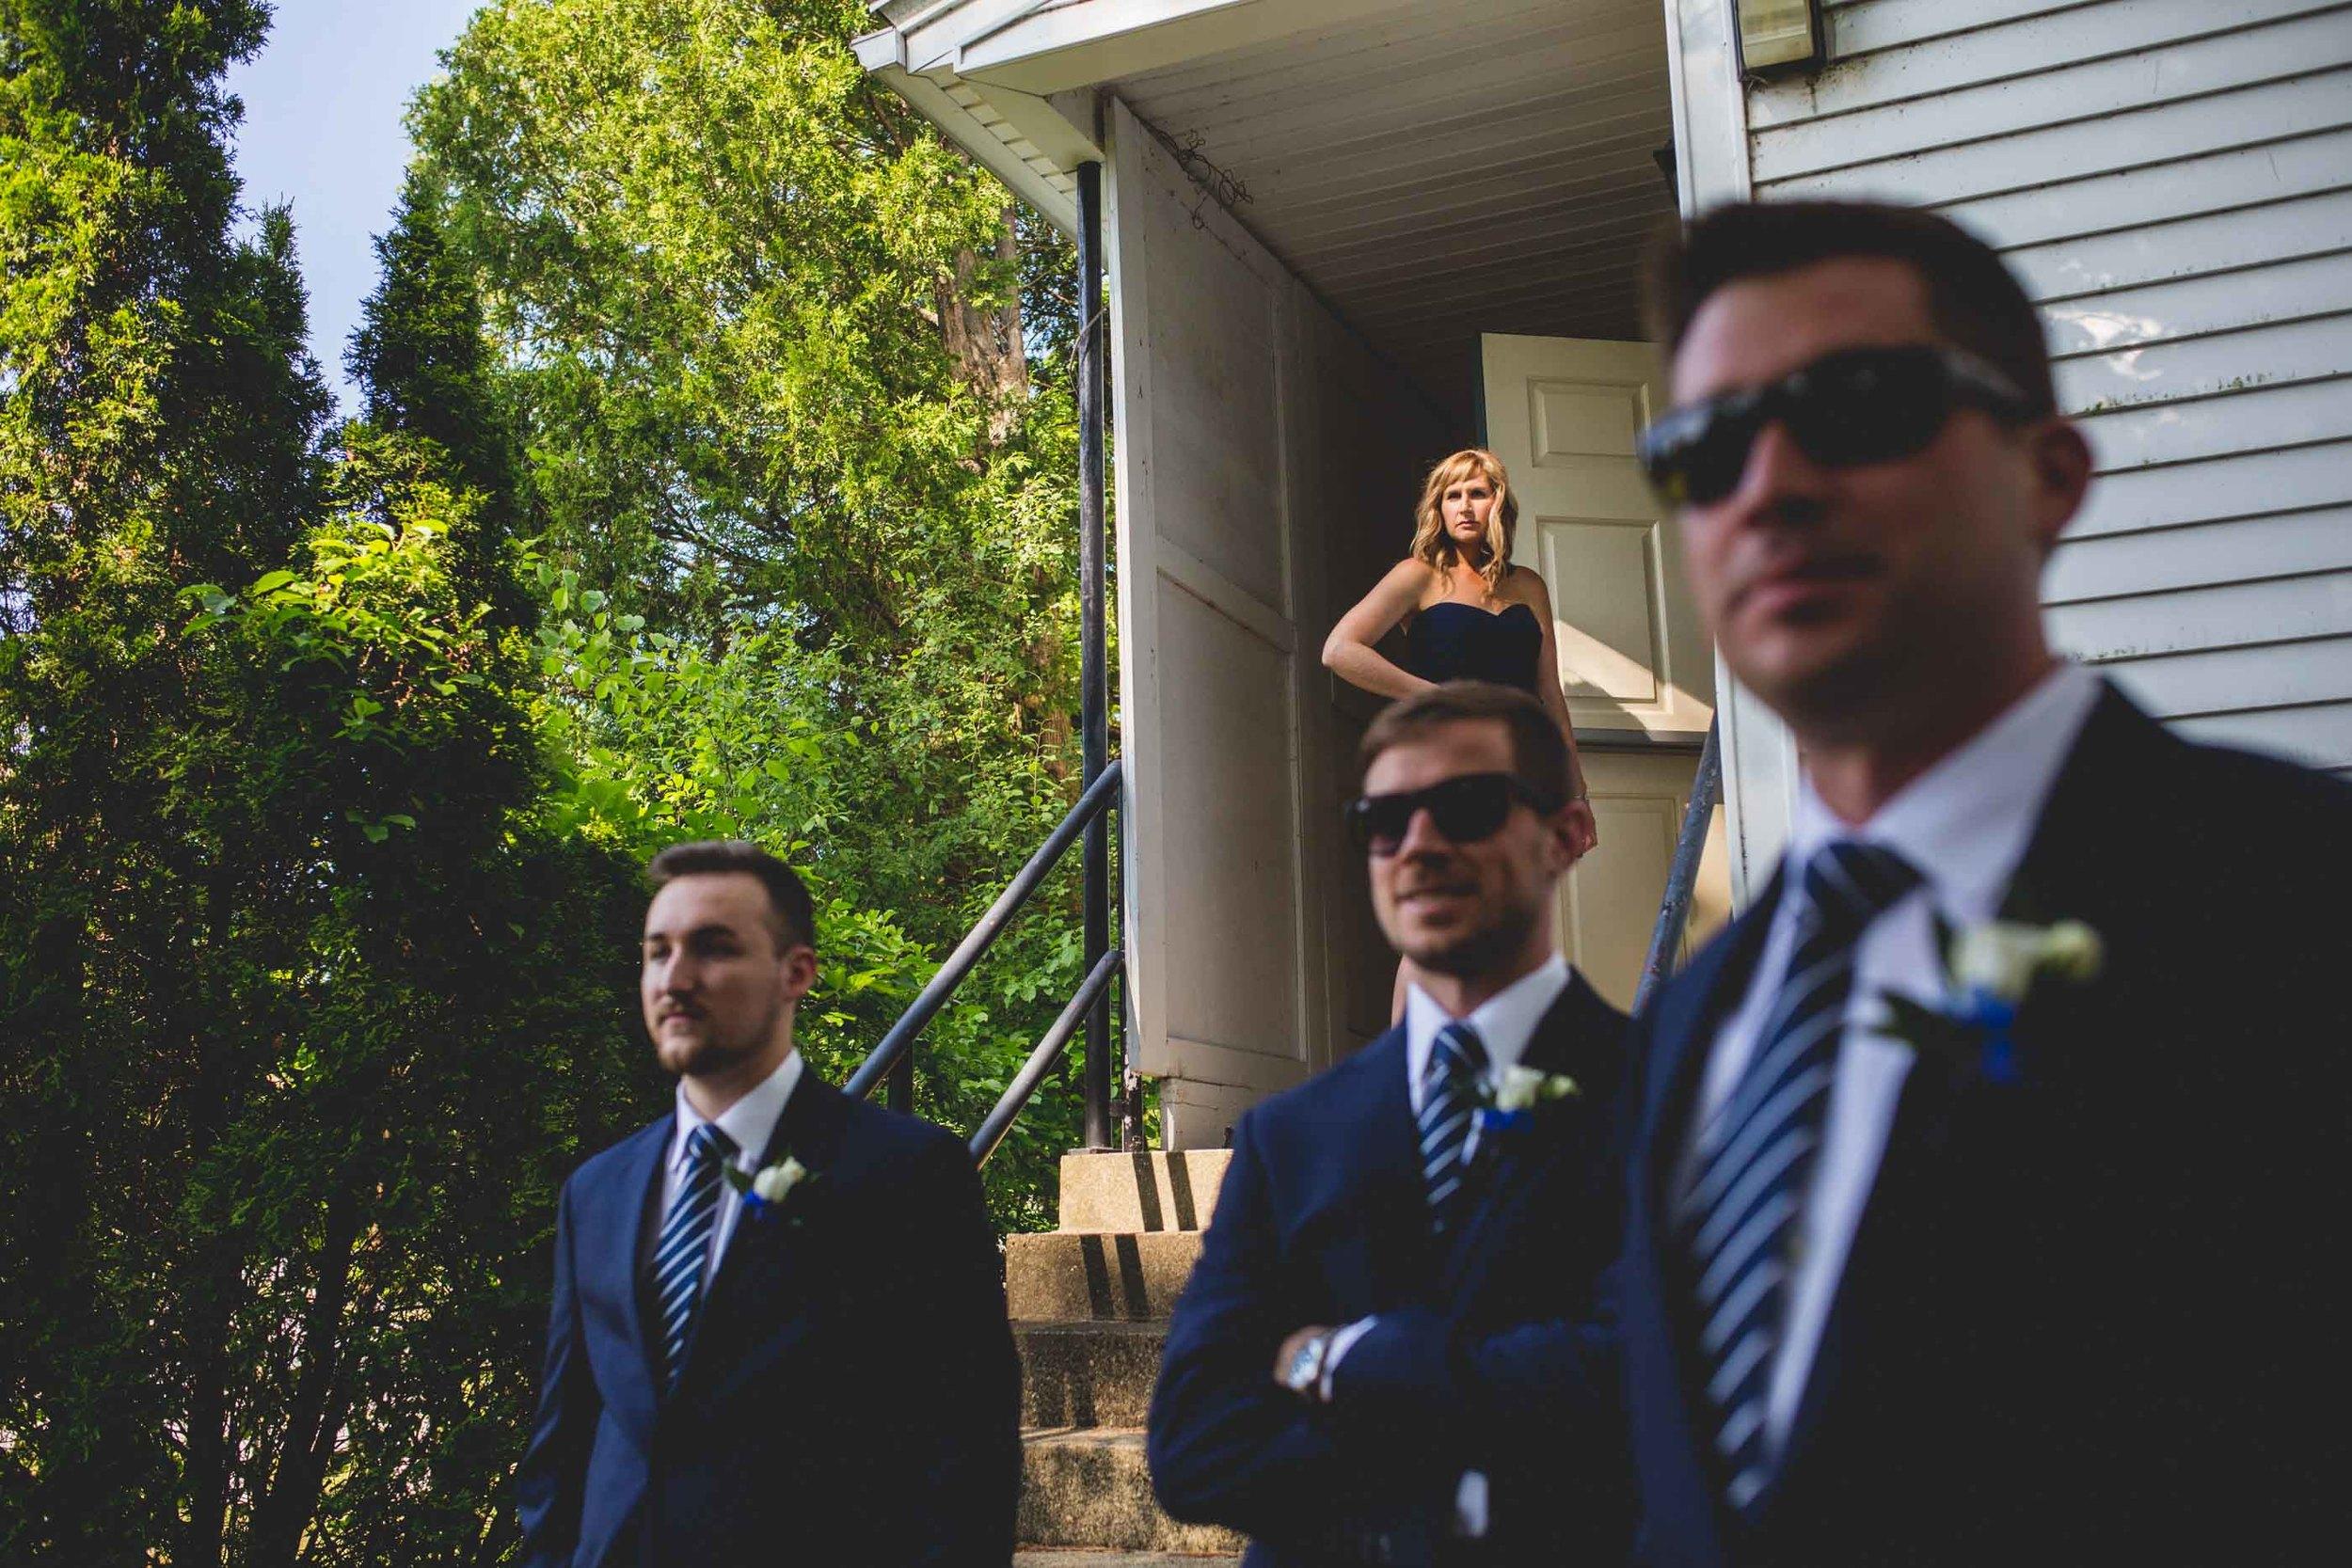 Danversport-Yacht-Club-wedding-6.jpg